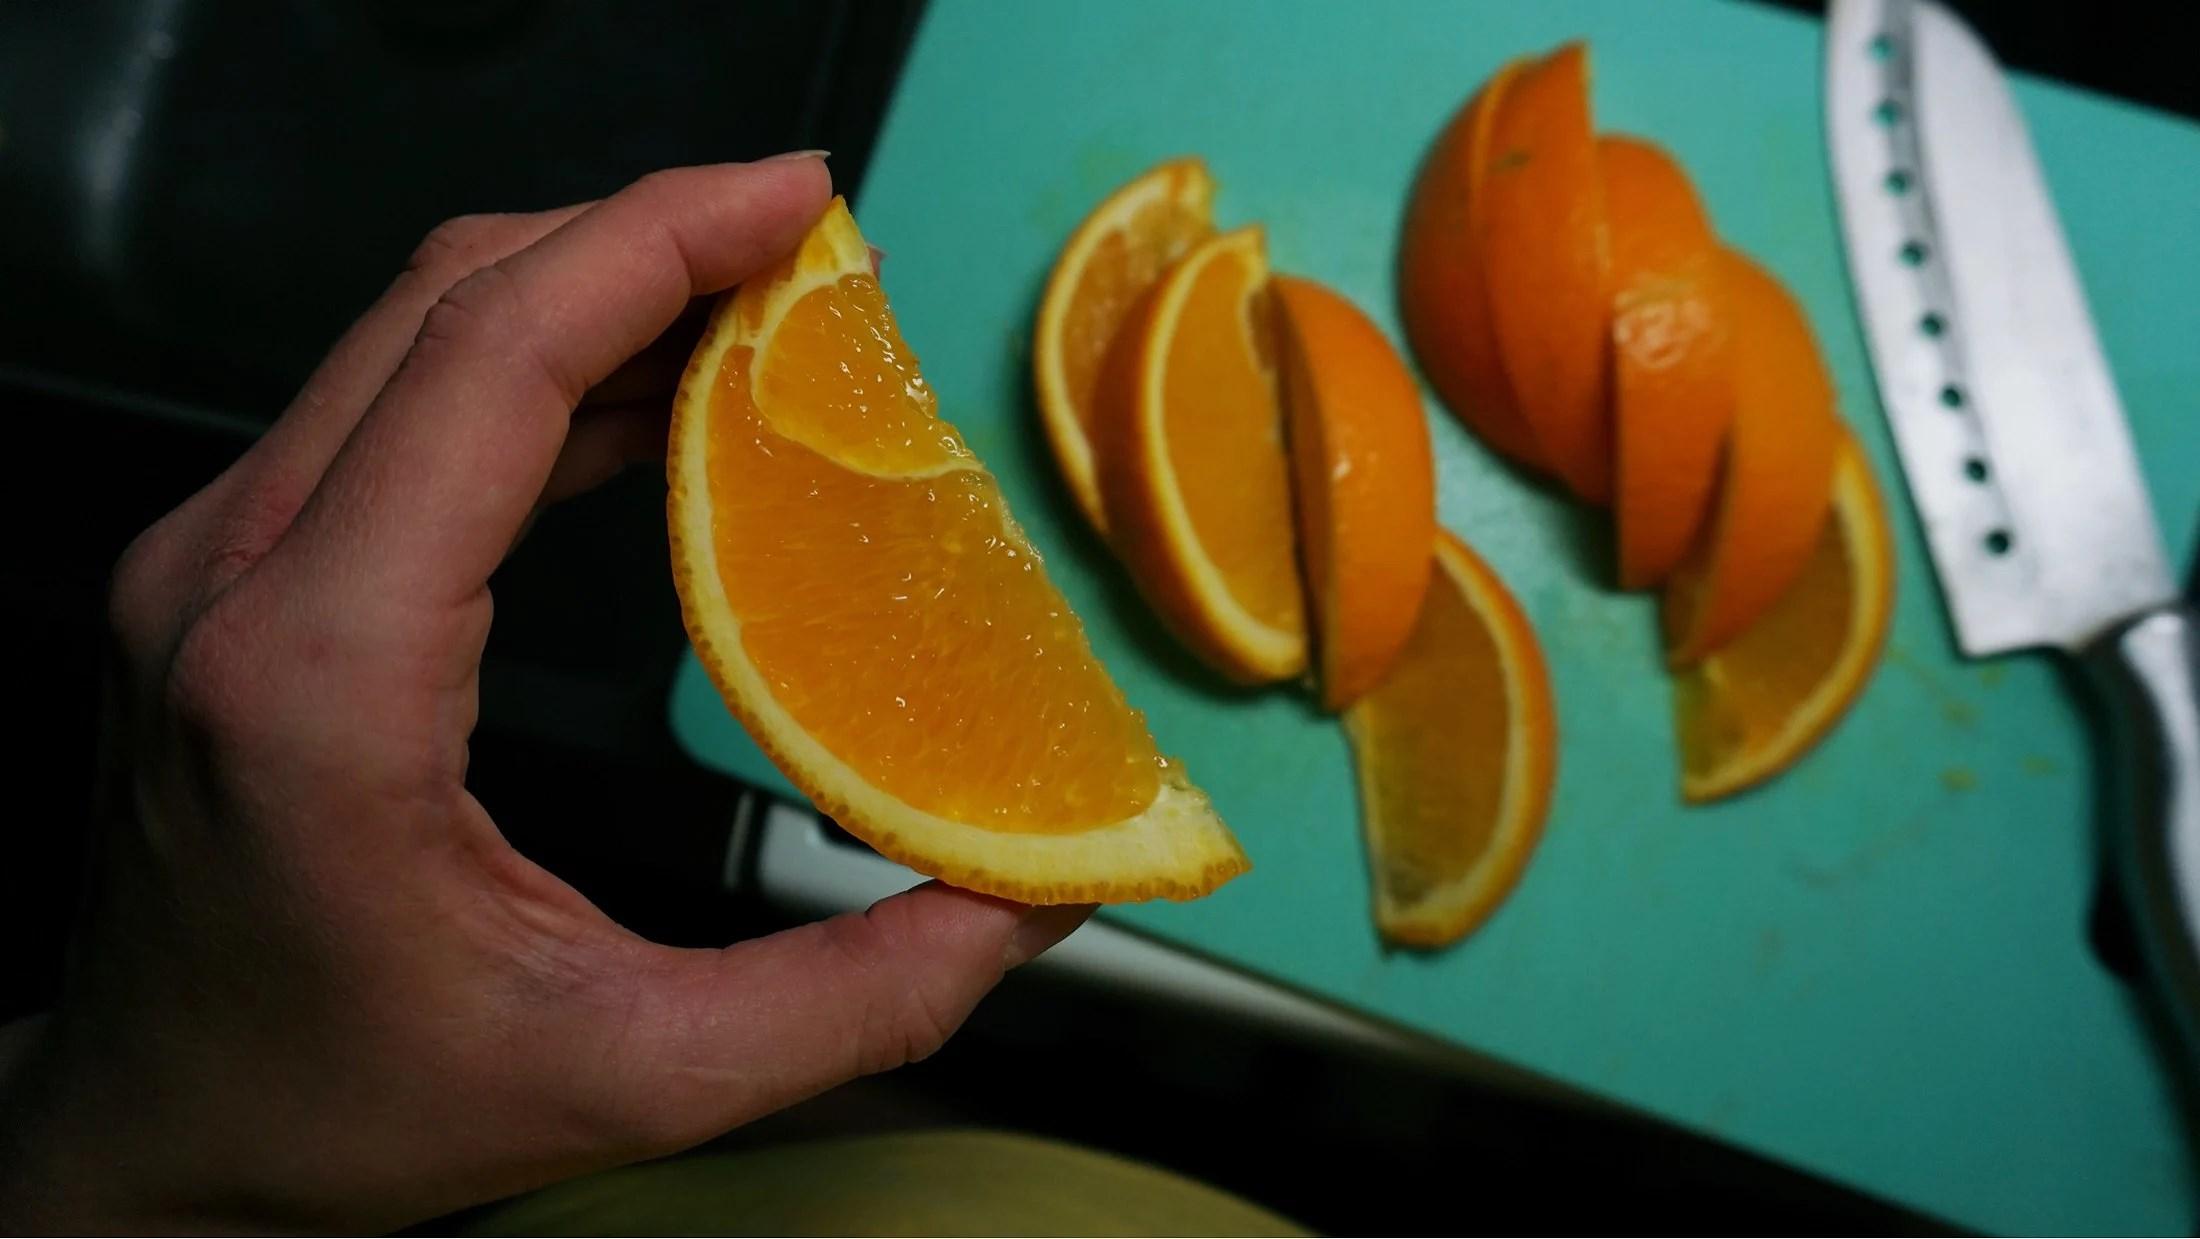 23:40